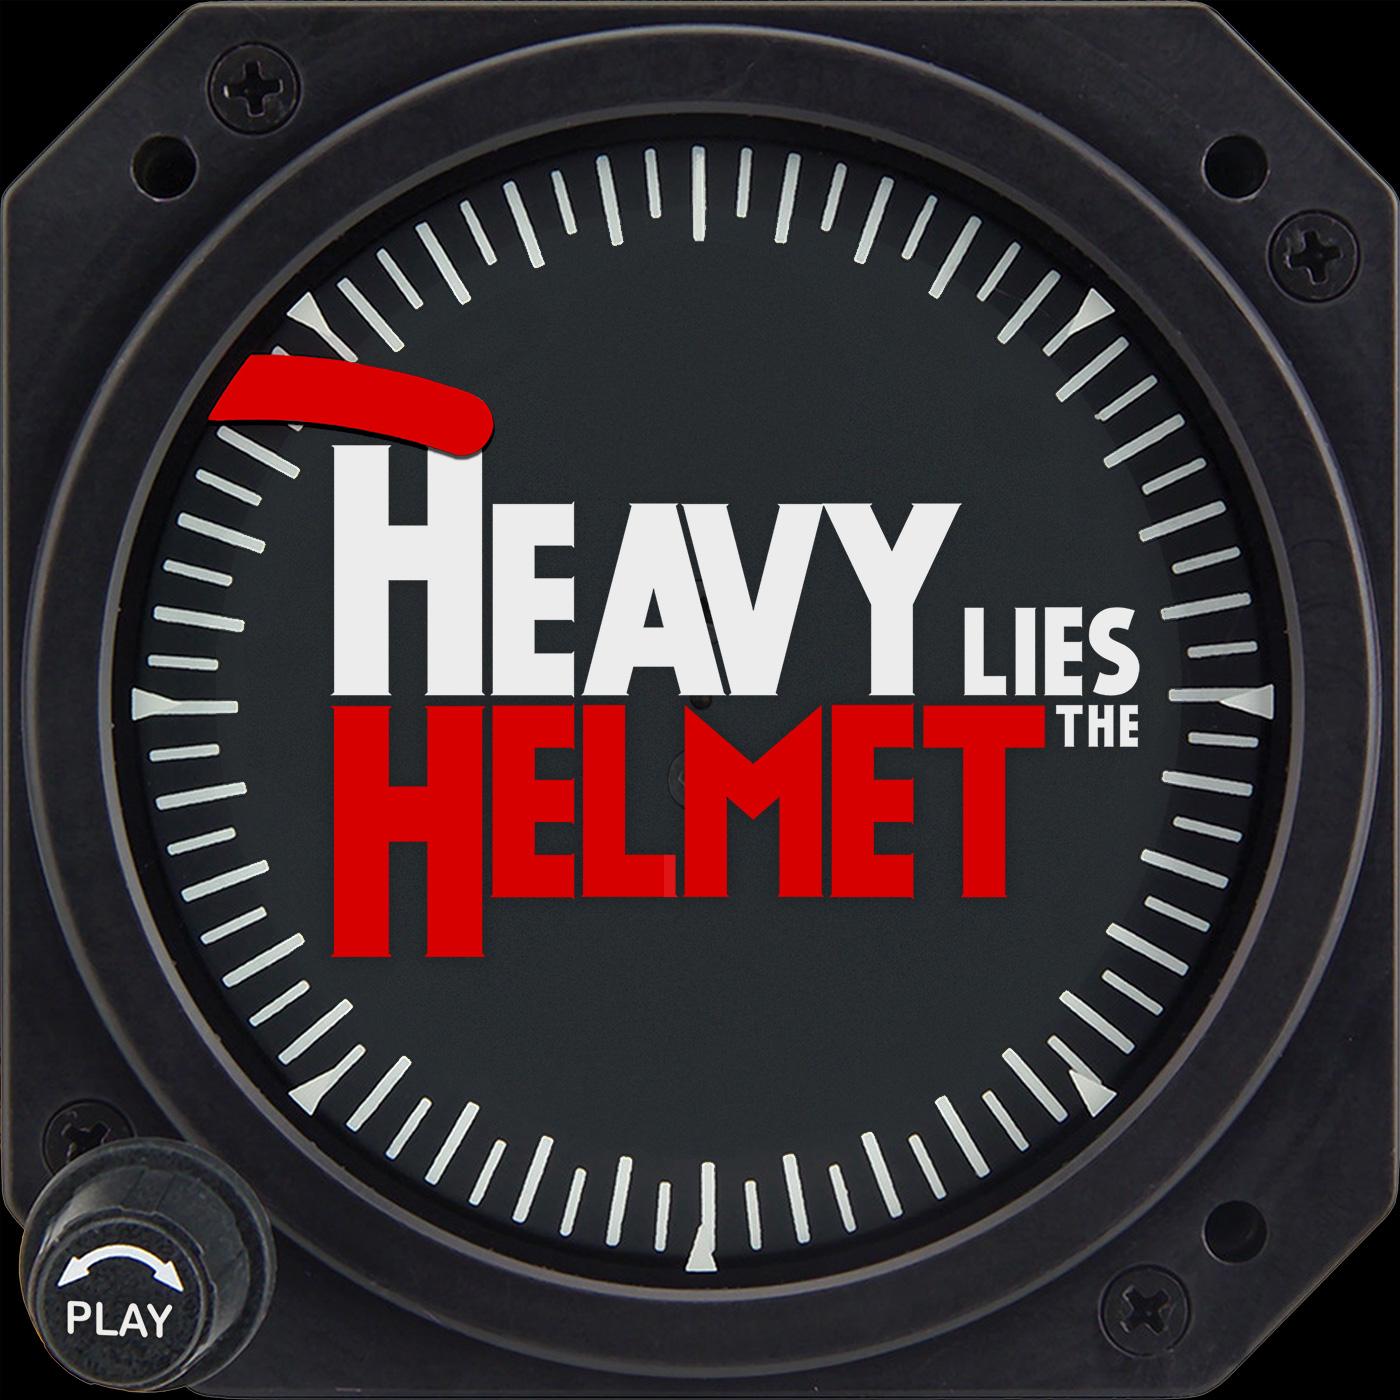 Heavy Lies the Helmet show art